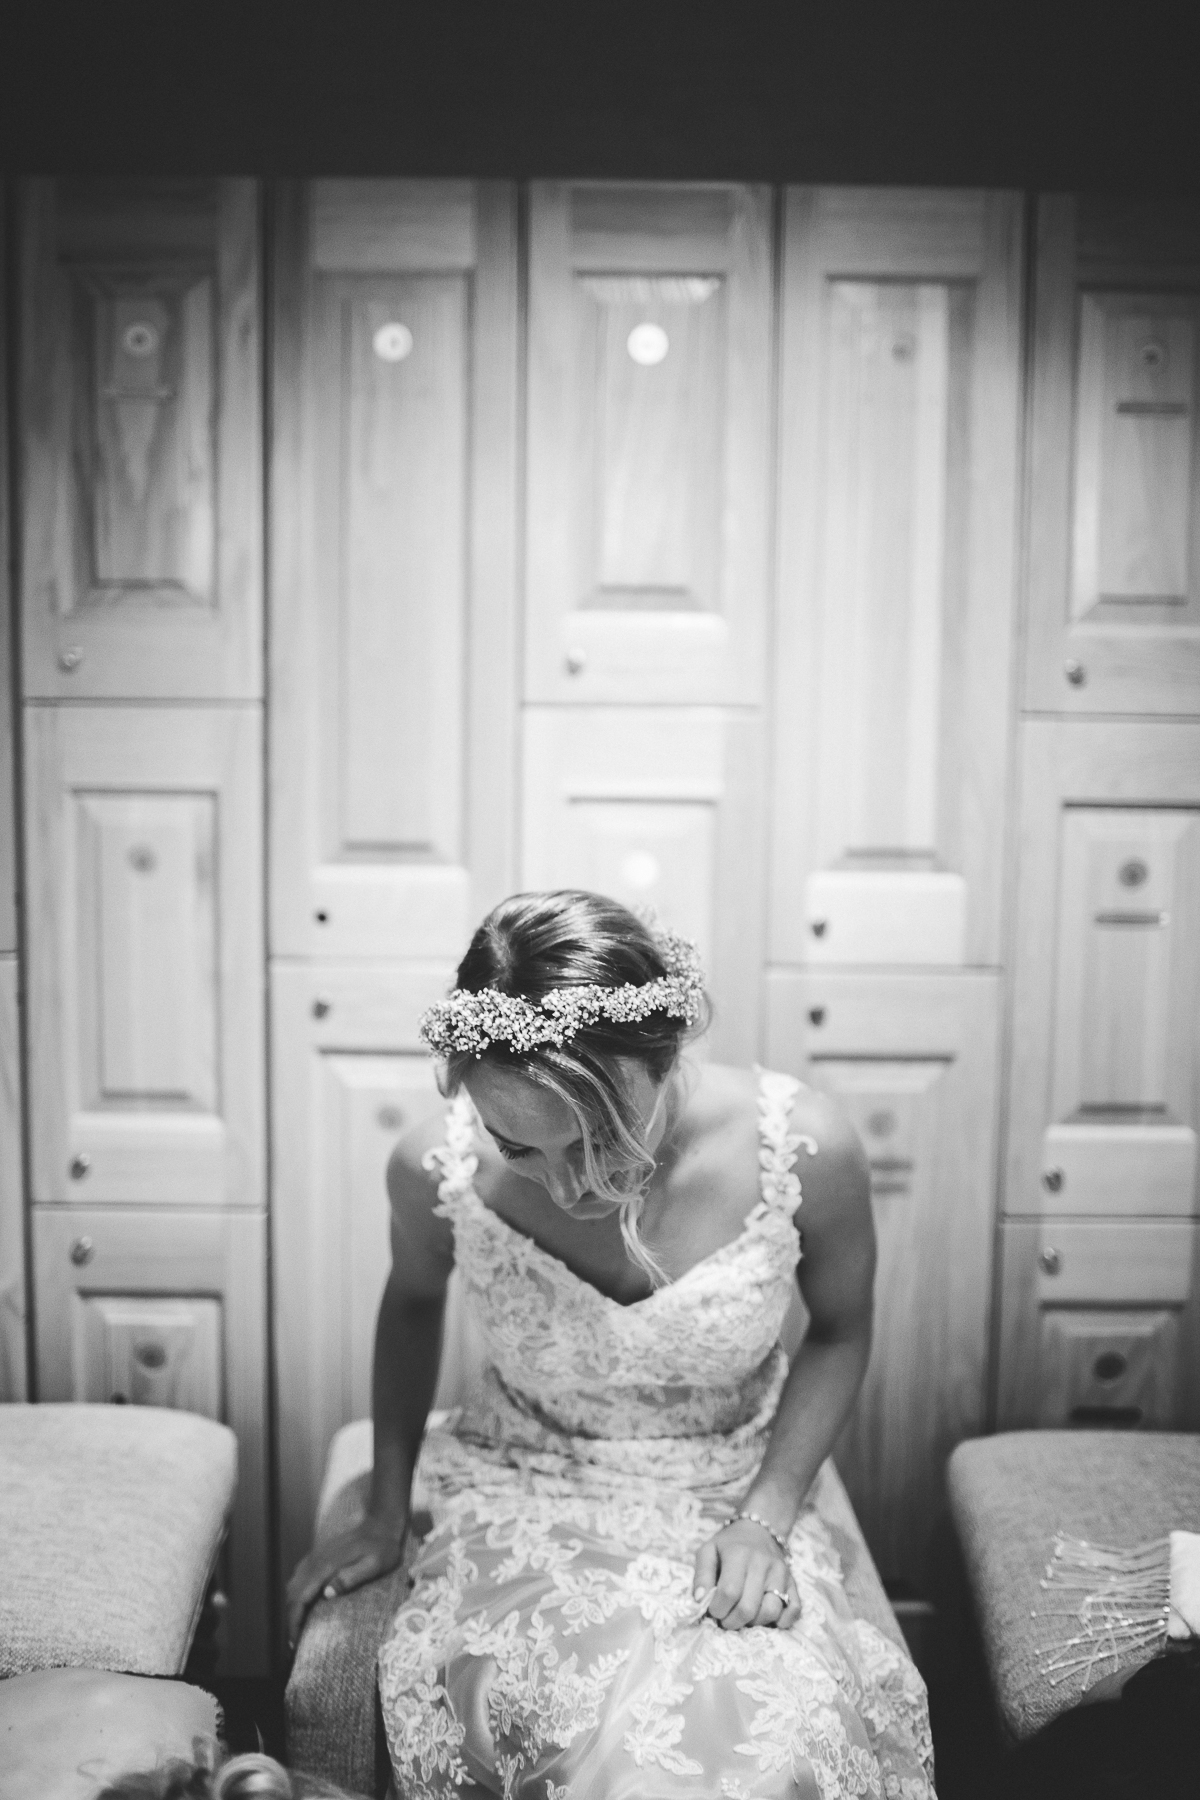 taylor-travis-grandfather-mountain-kelley-raye-north-carolina-wedding-photographer-7.jpg